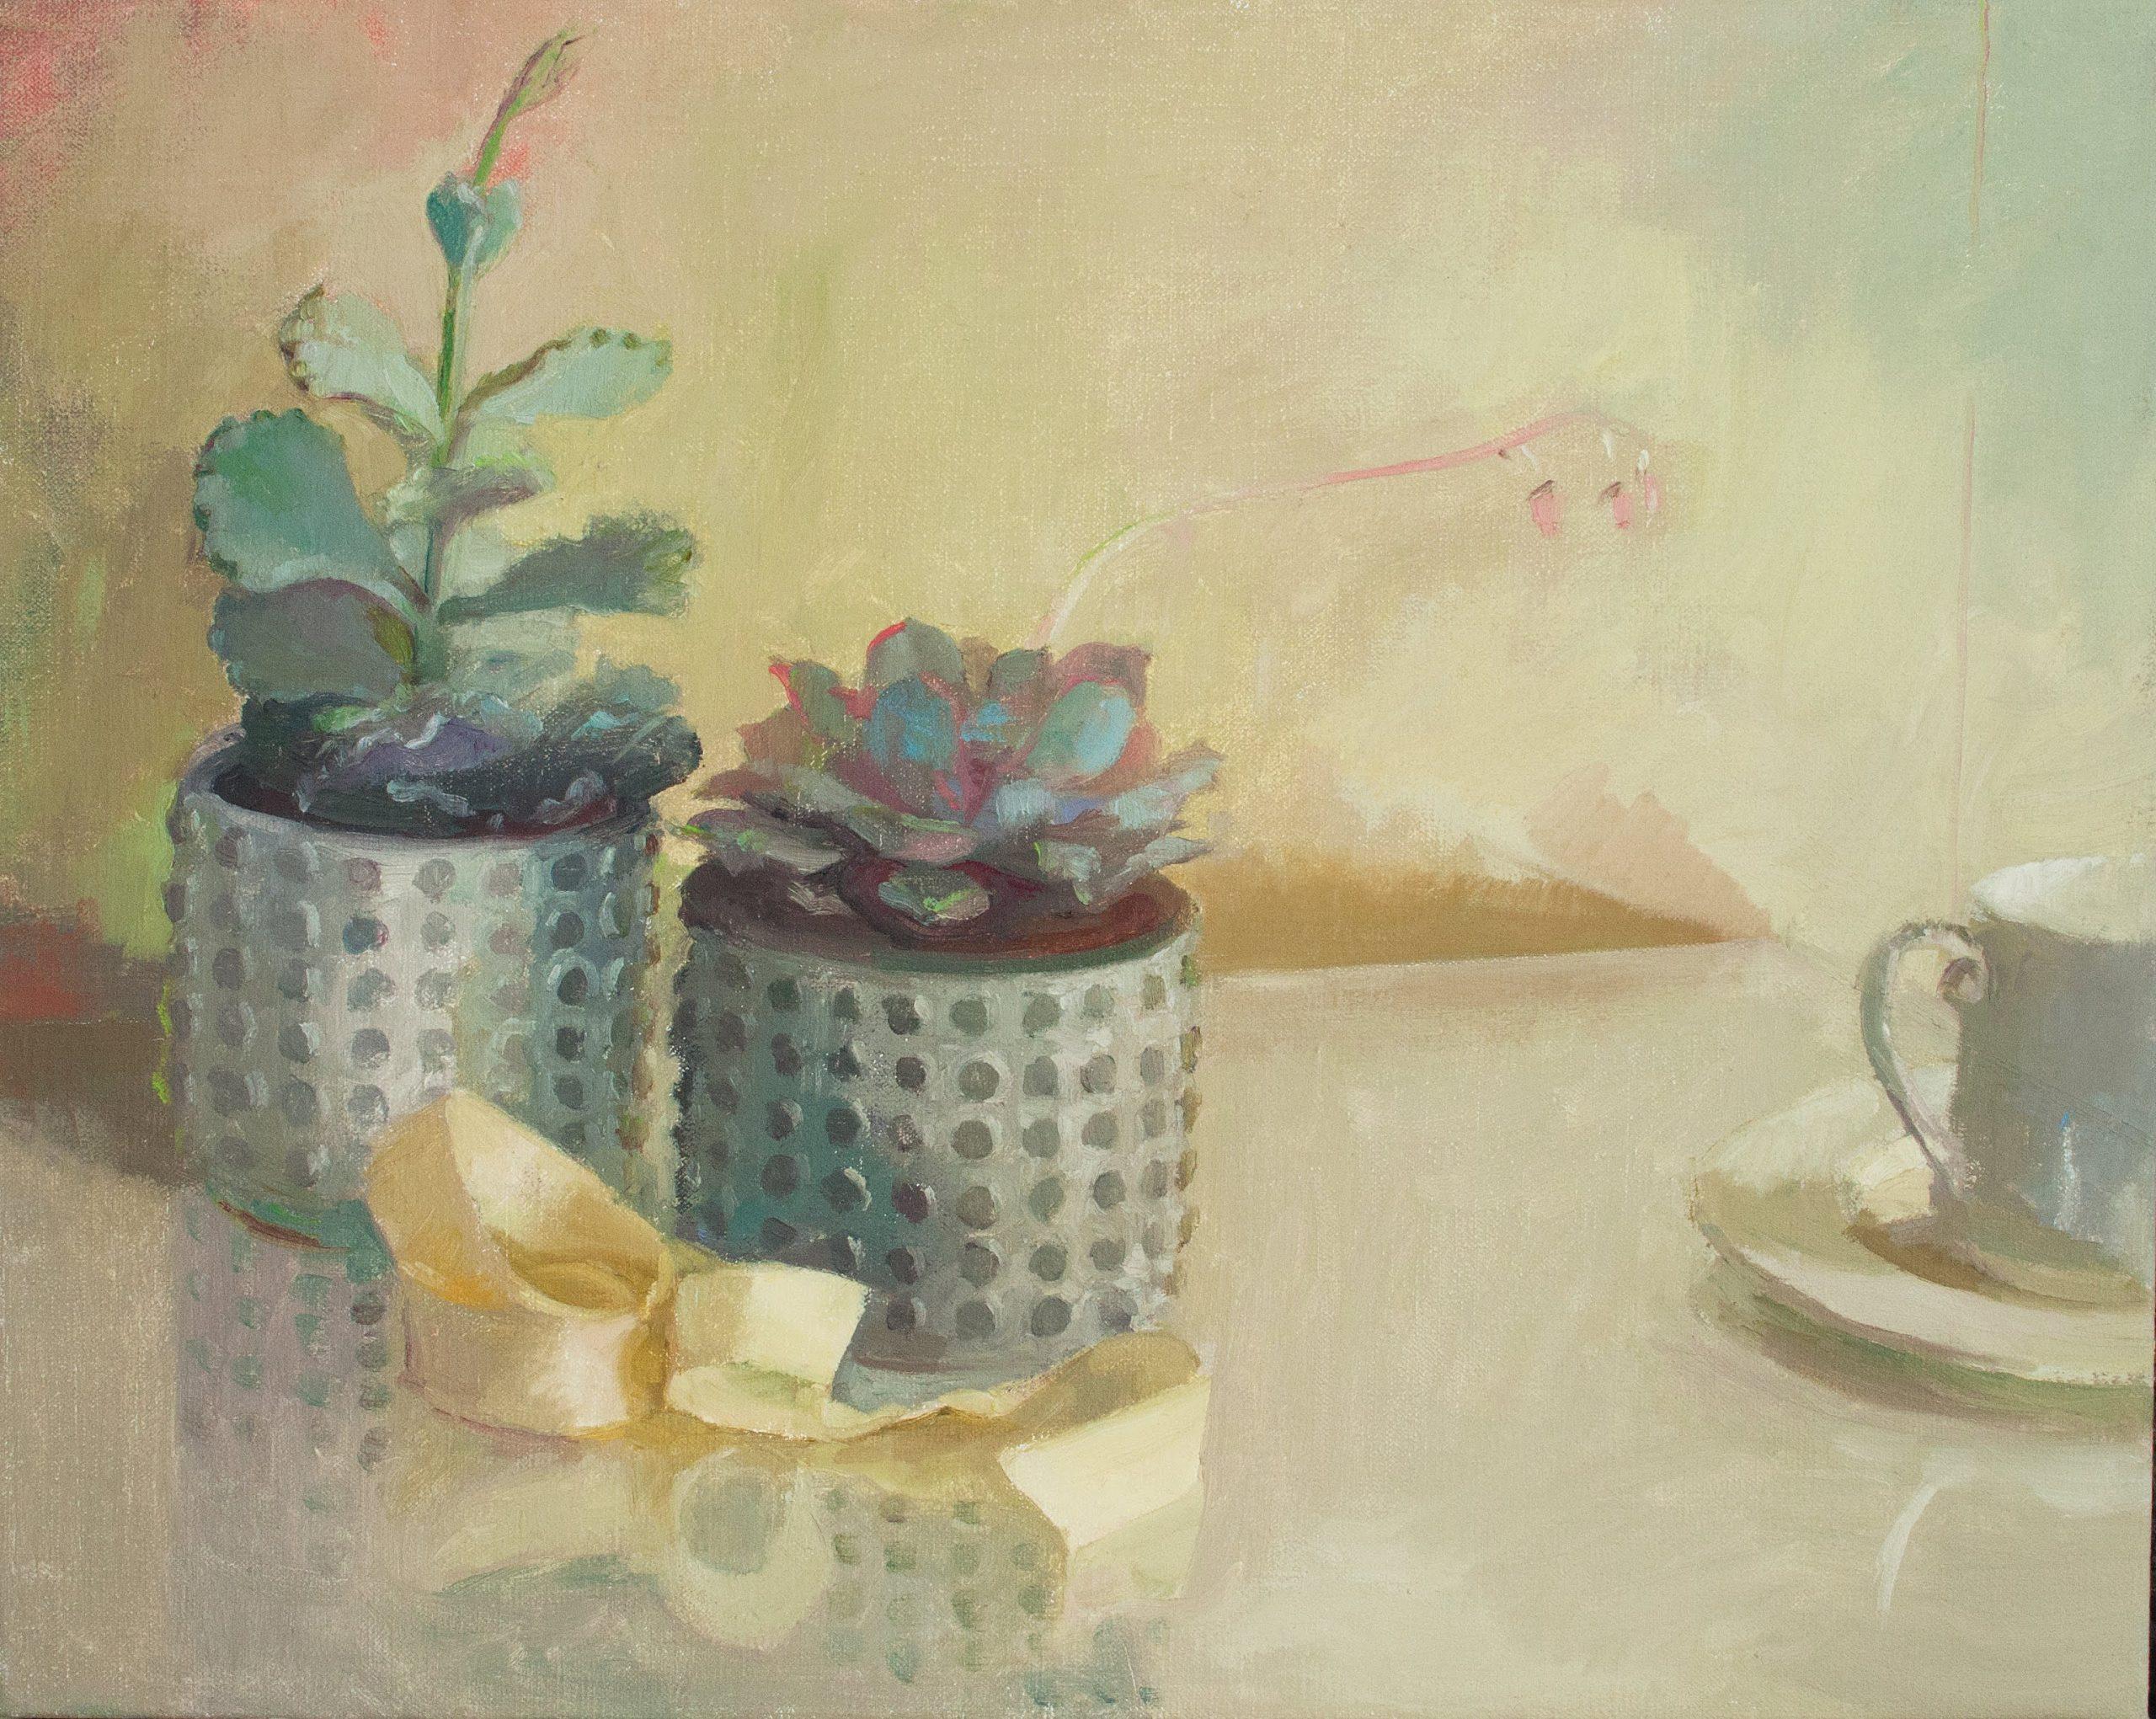 "Ilaria Rosselli Del Turco - Still Life with Succulents - Oil on Linen - 16"" x 20"""